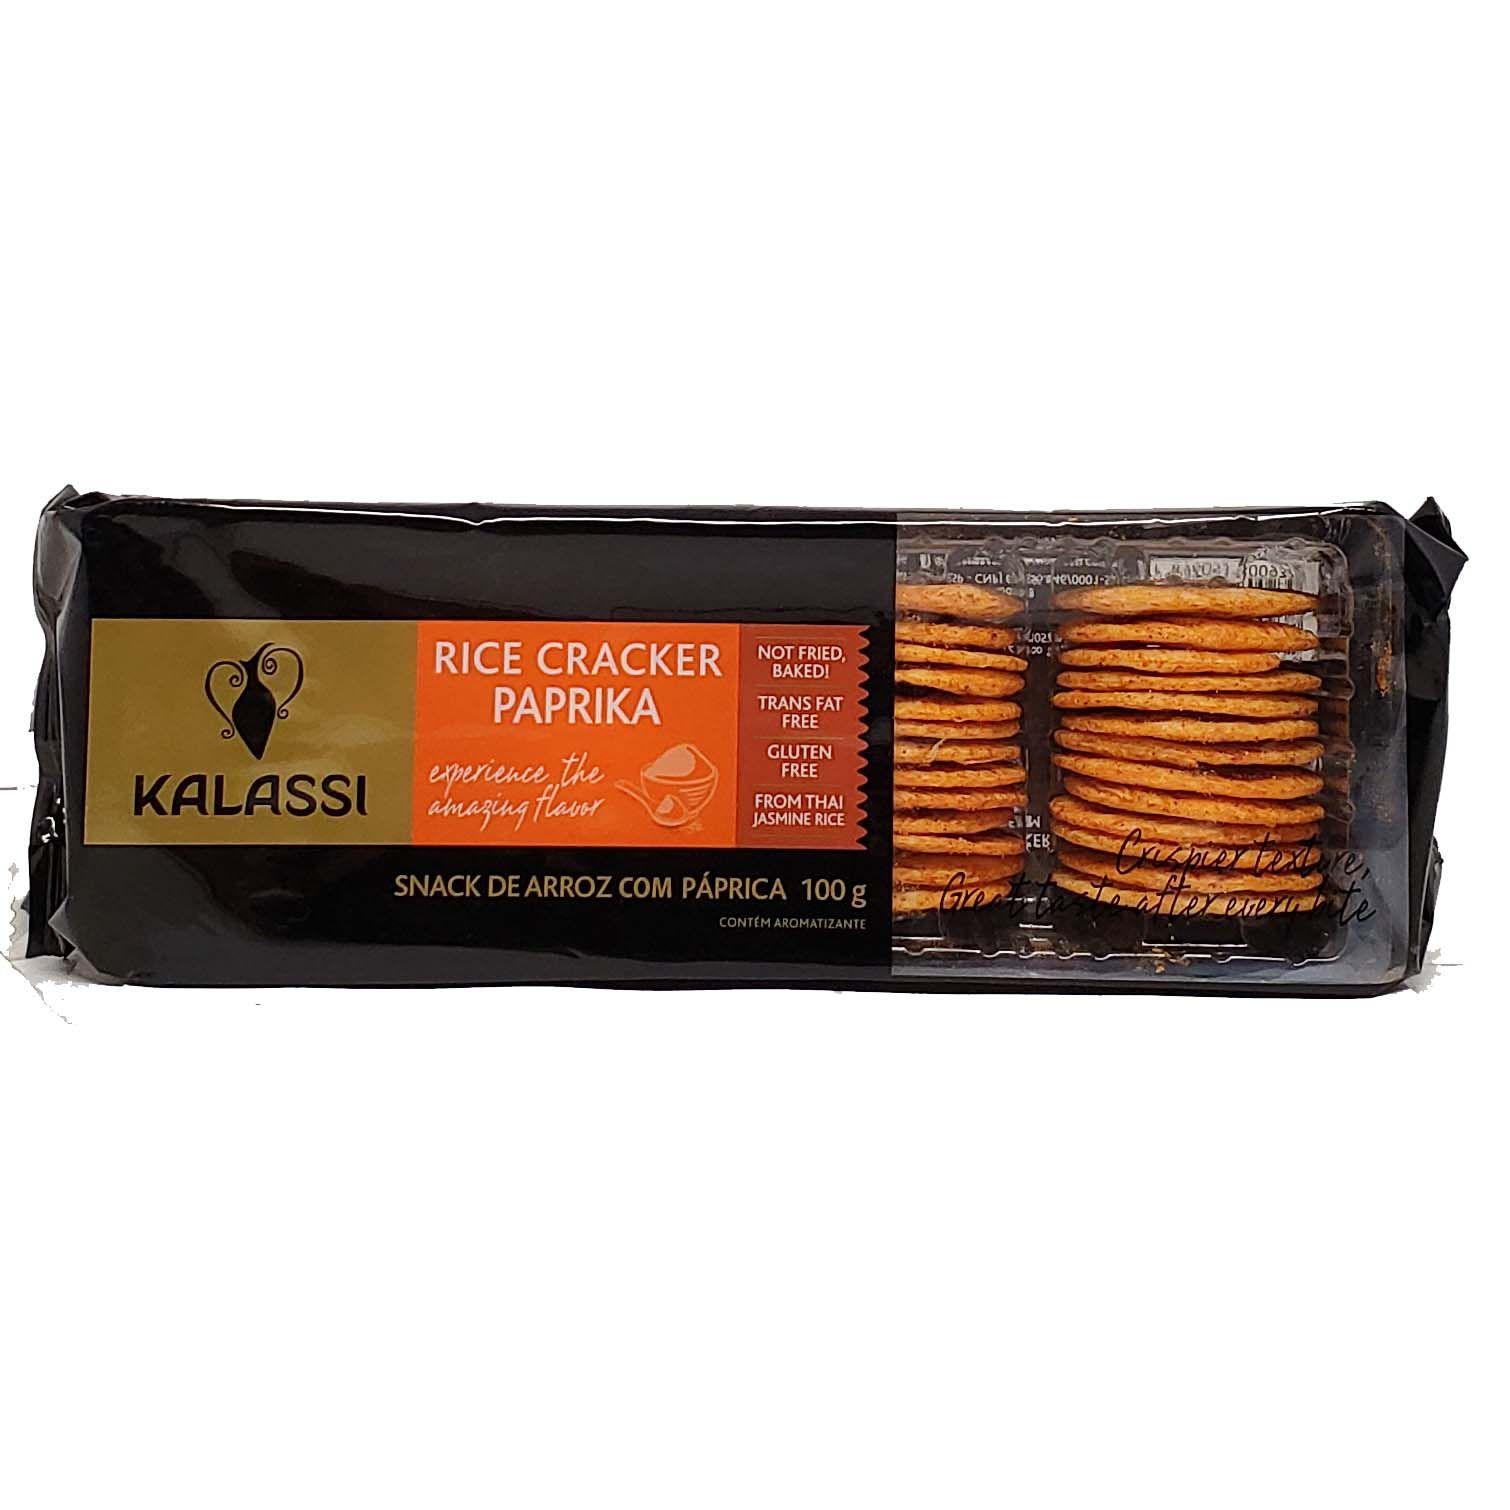 Snack De Arroz Sabor Paprika Kalassi - 100g -